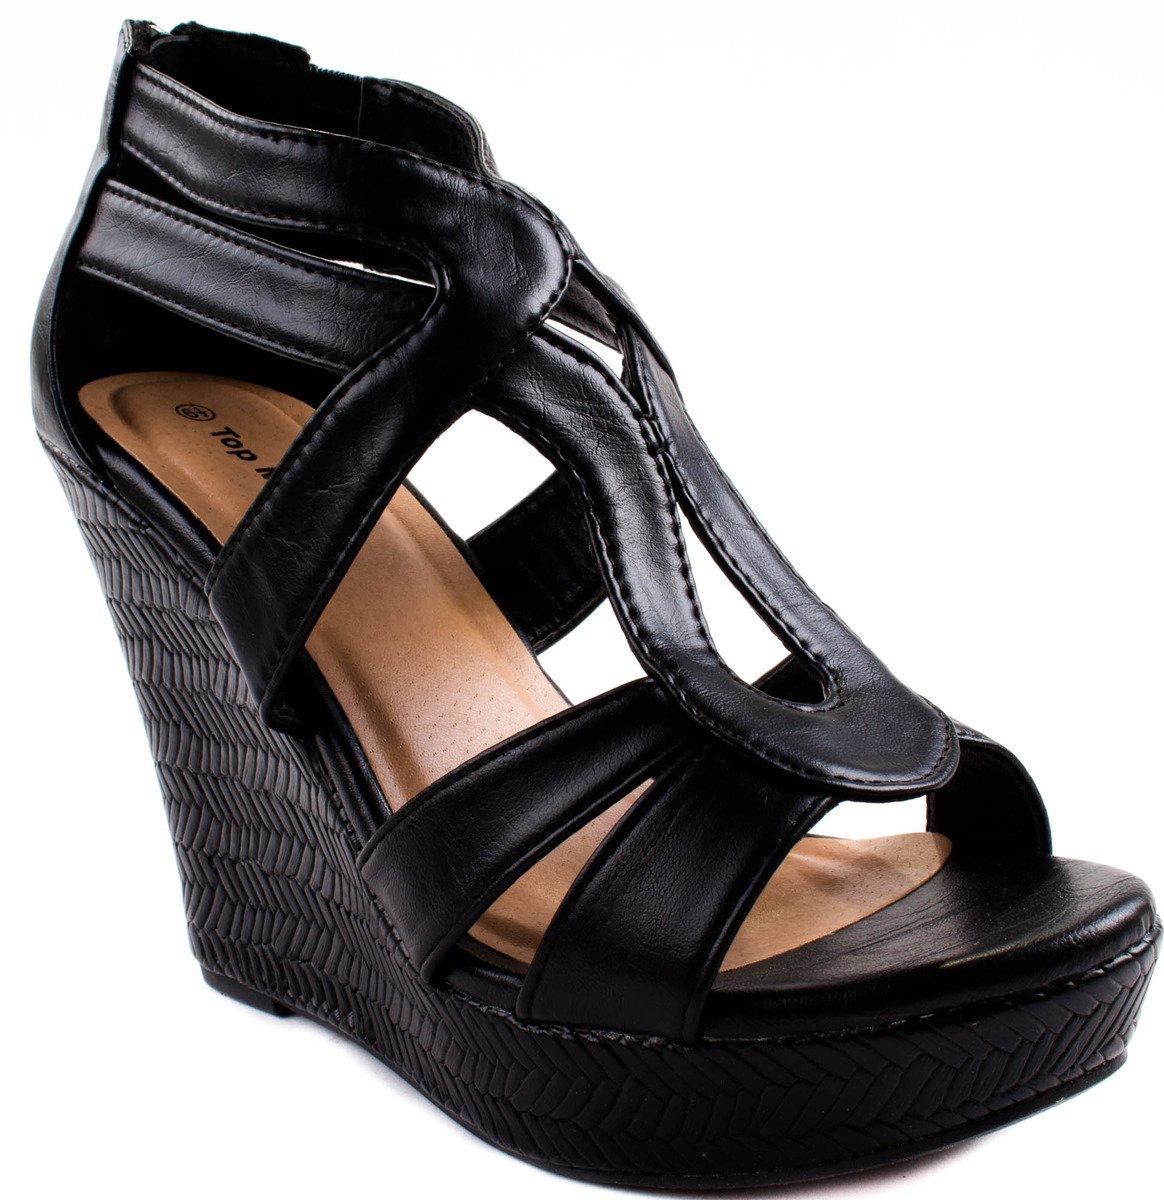 Top Moda Shoes Women's Lindy-1 Black High Heel Pumps 6.5 D(M) US